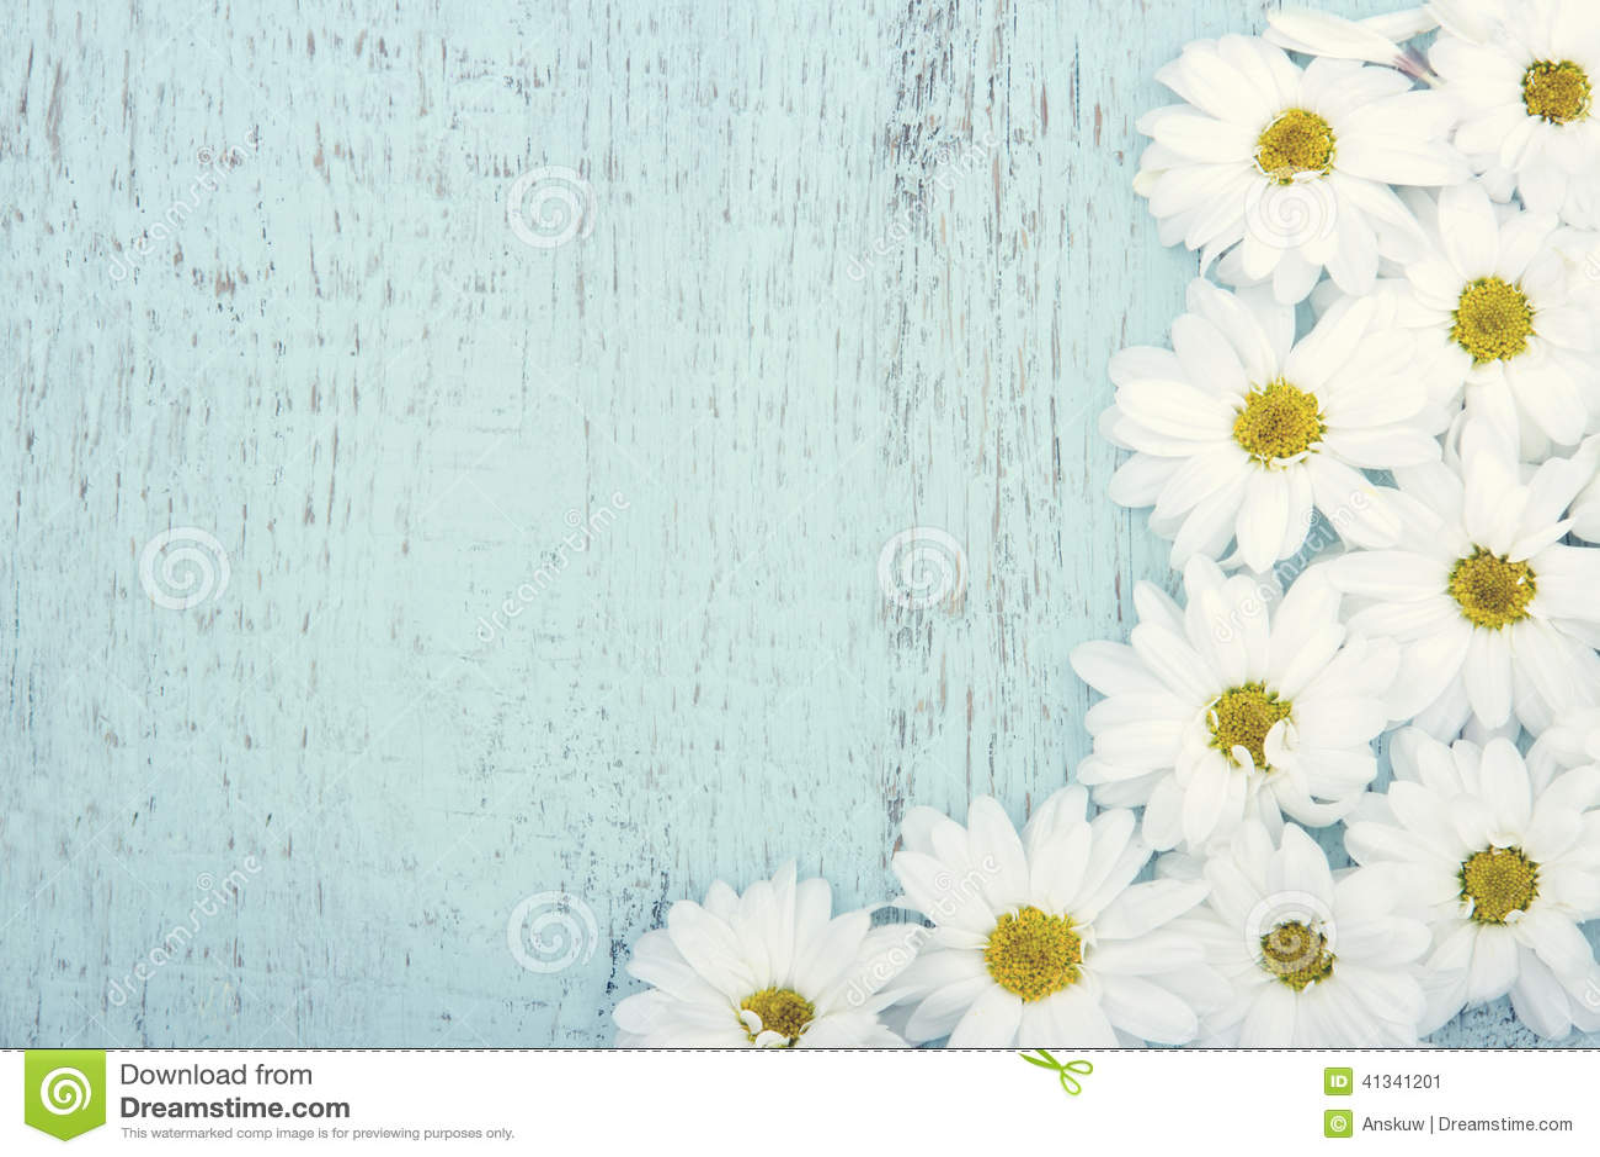 Vintage daisies background